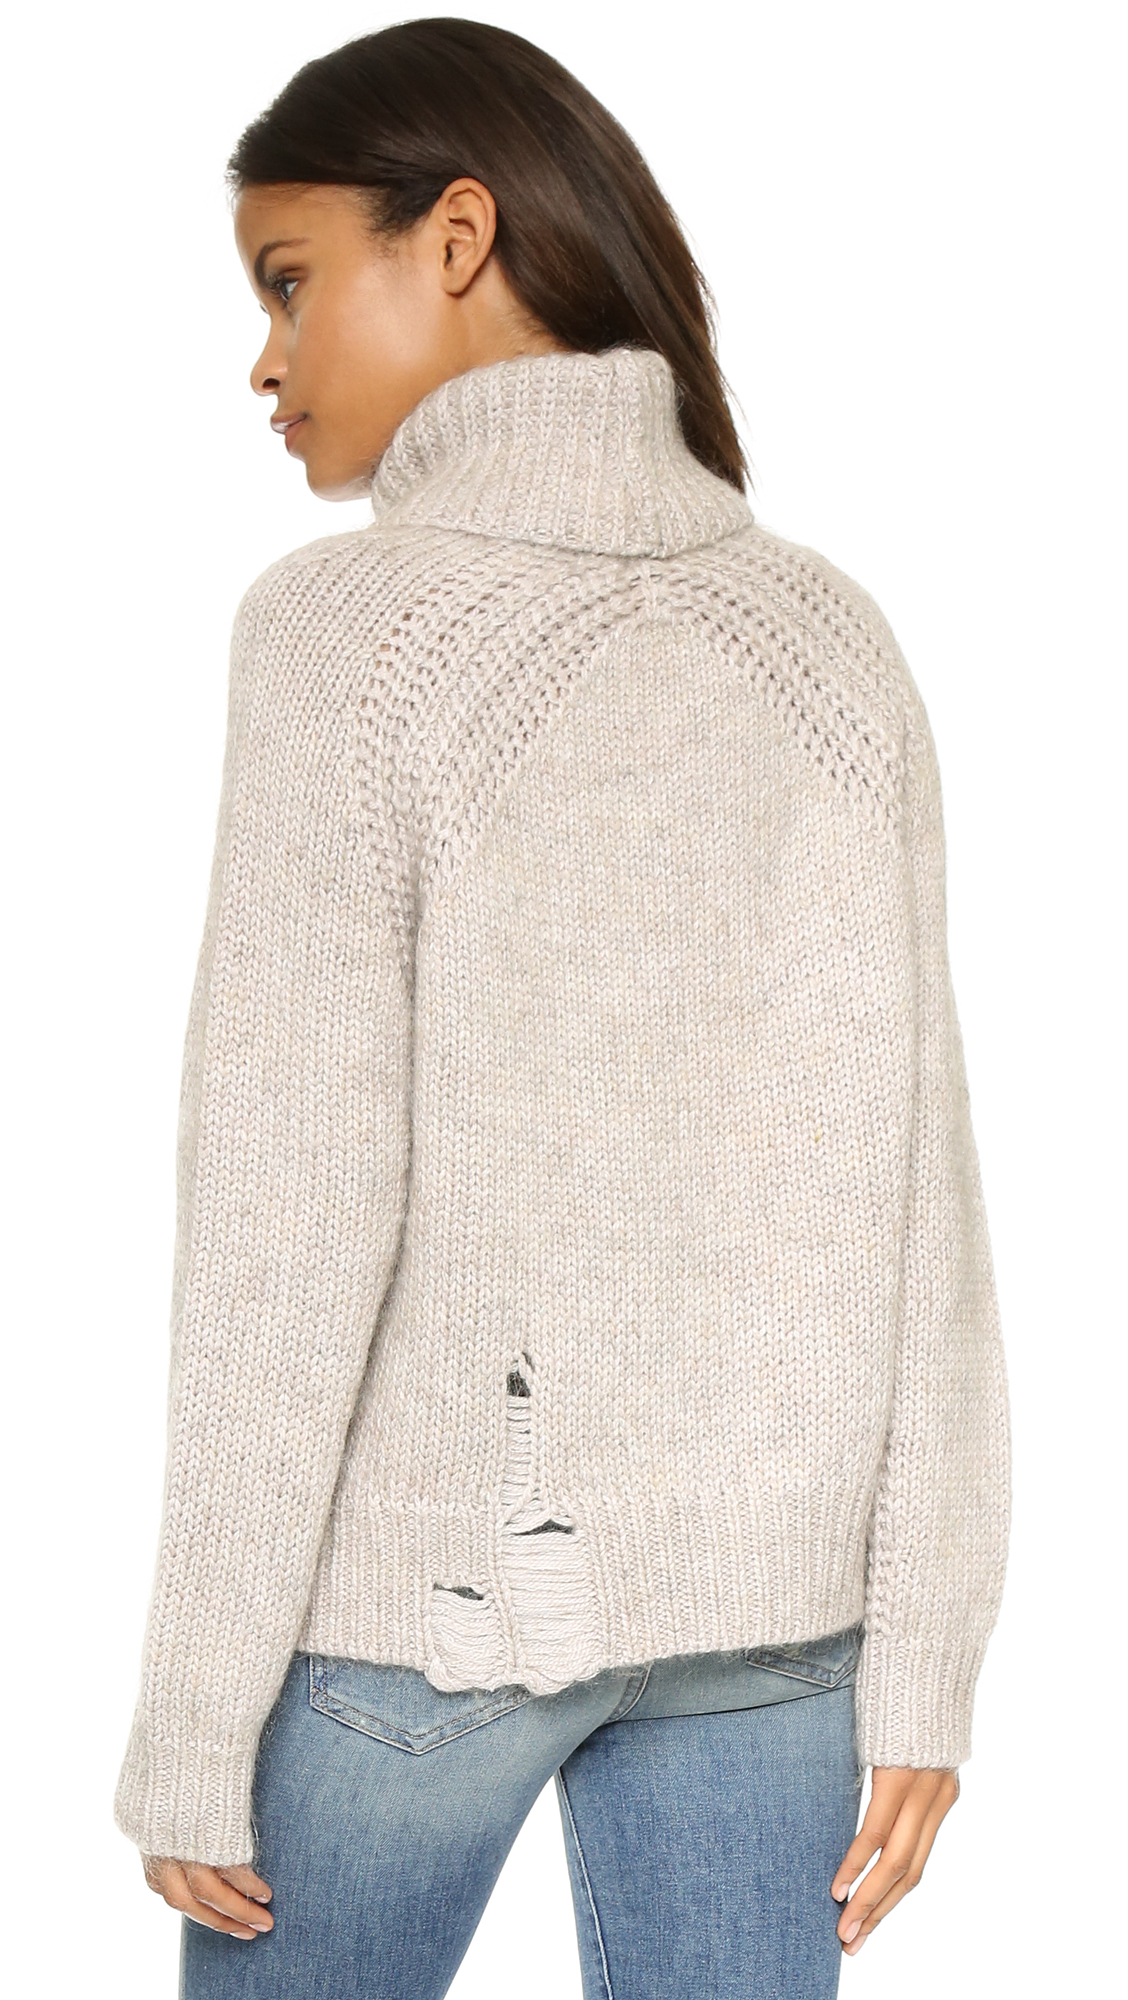 Raquel allegra Turtleneck Pullover Sweater in Natural   Lyst